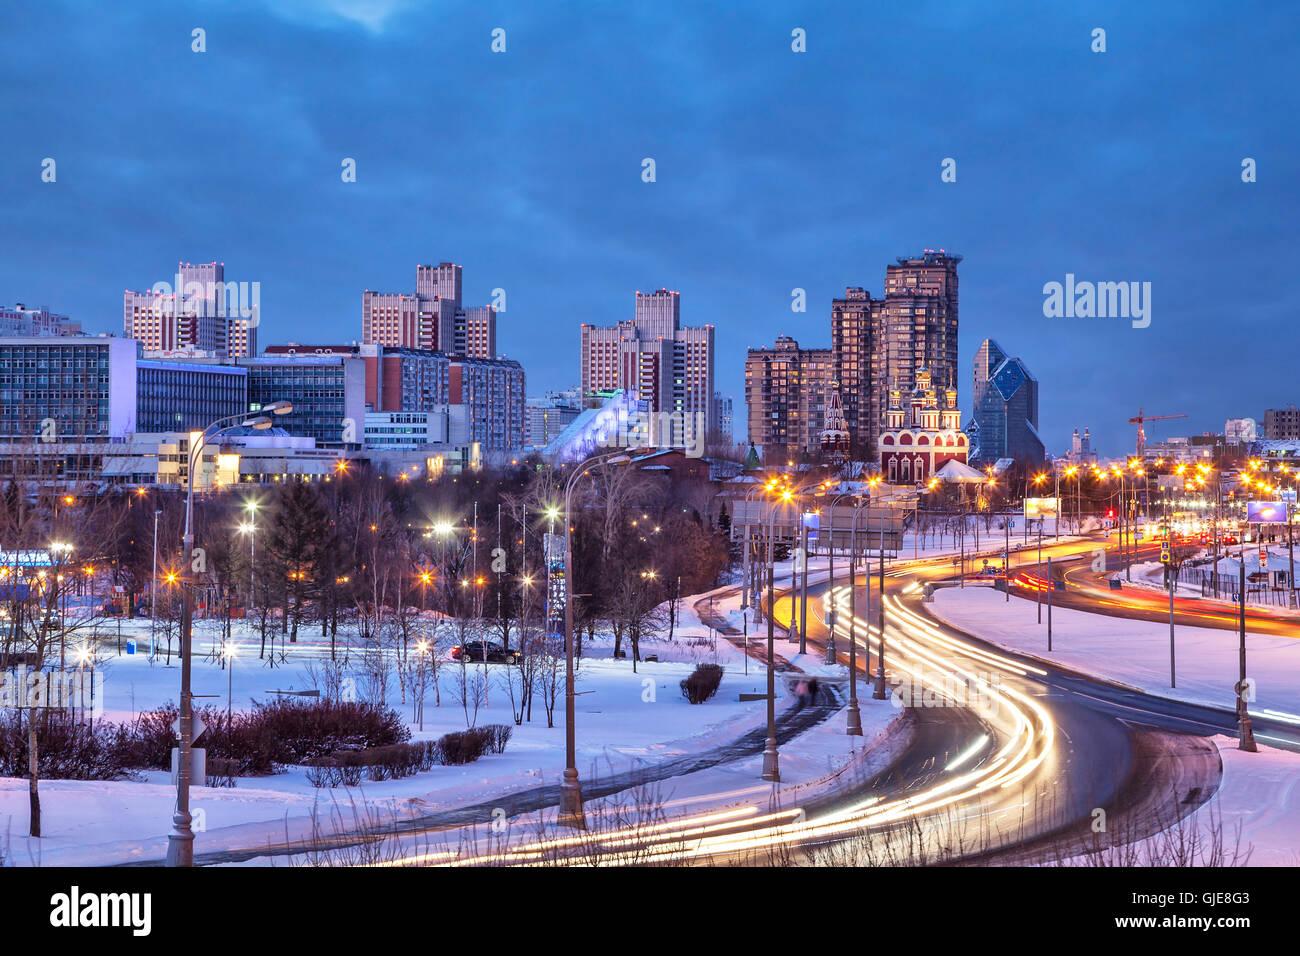 Distrito Troparevo en la noche de invierno, Moscú, Rusia Imagen De Stock